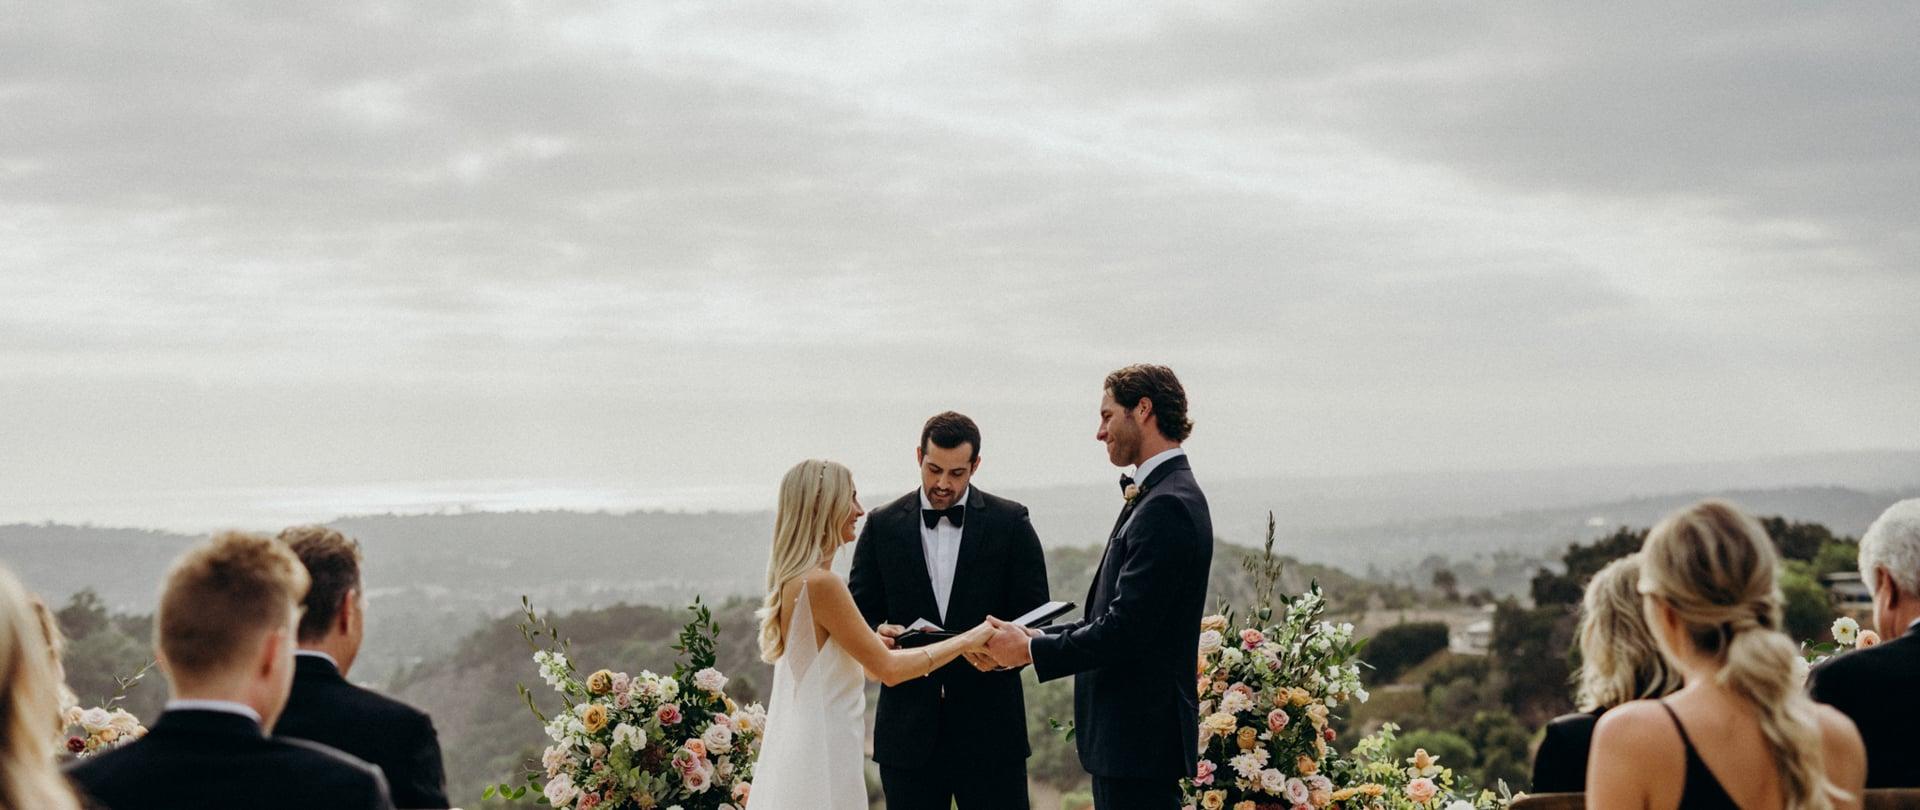 Bailey & Spencer Wedding Video Filmed at California, United States